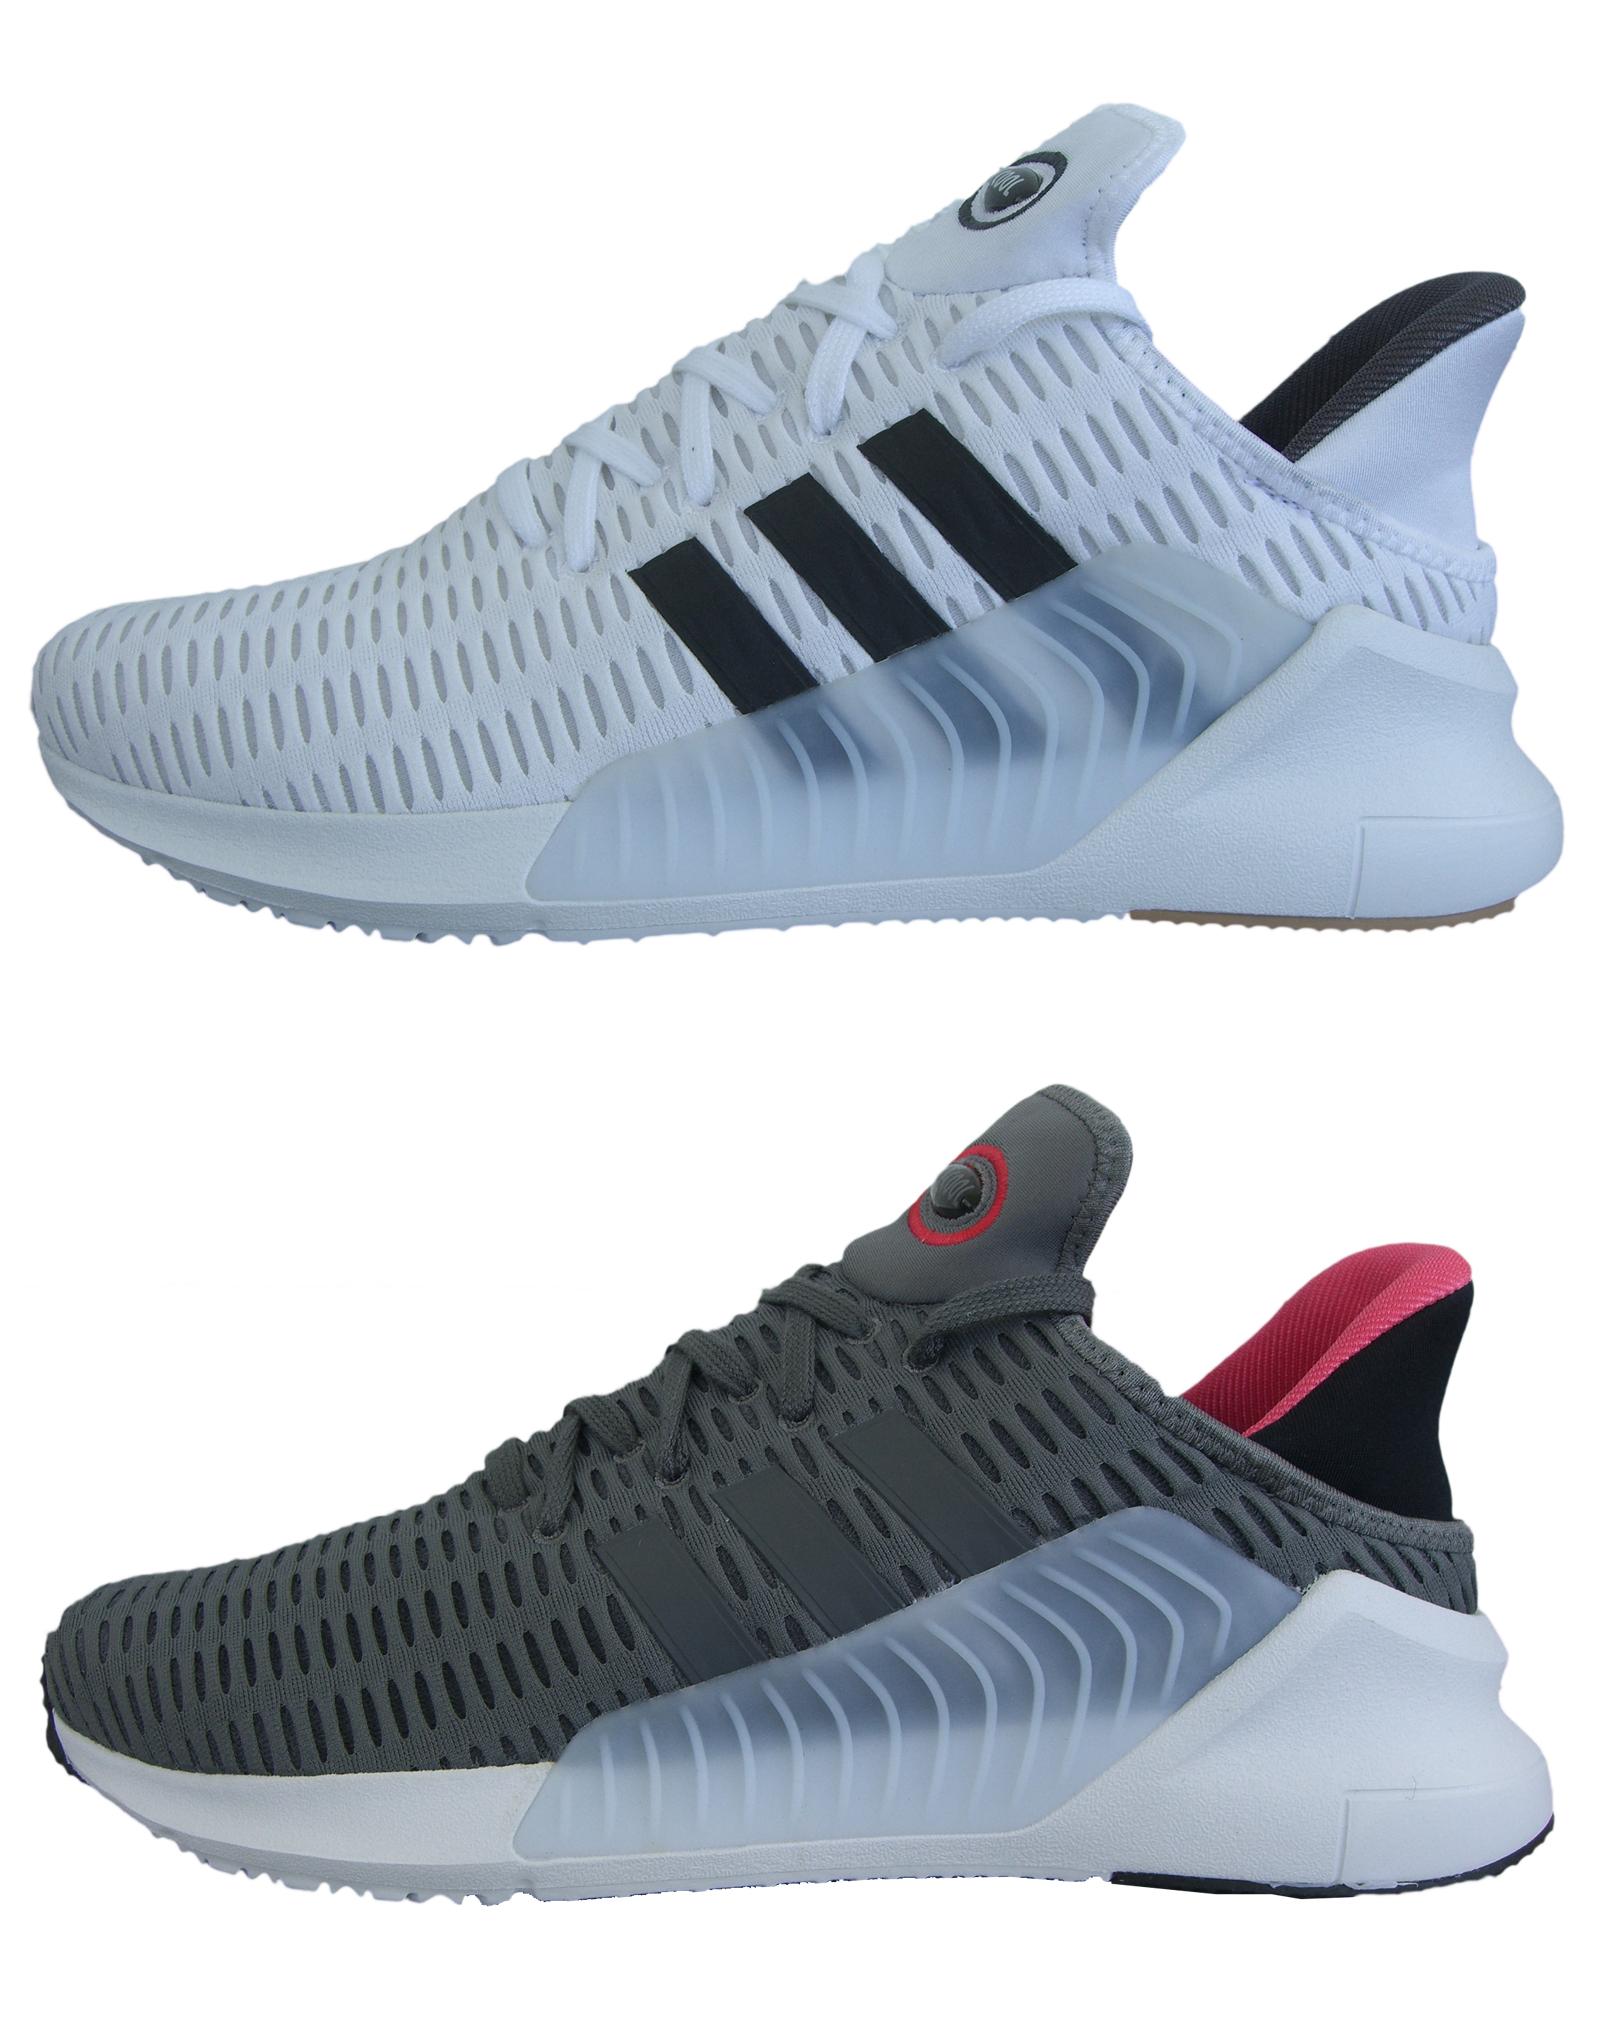 Climacool Sneaker zu Originals Schuhe 0217 Herren Details Adidas cqS35jL4AR